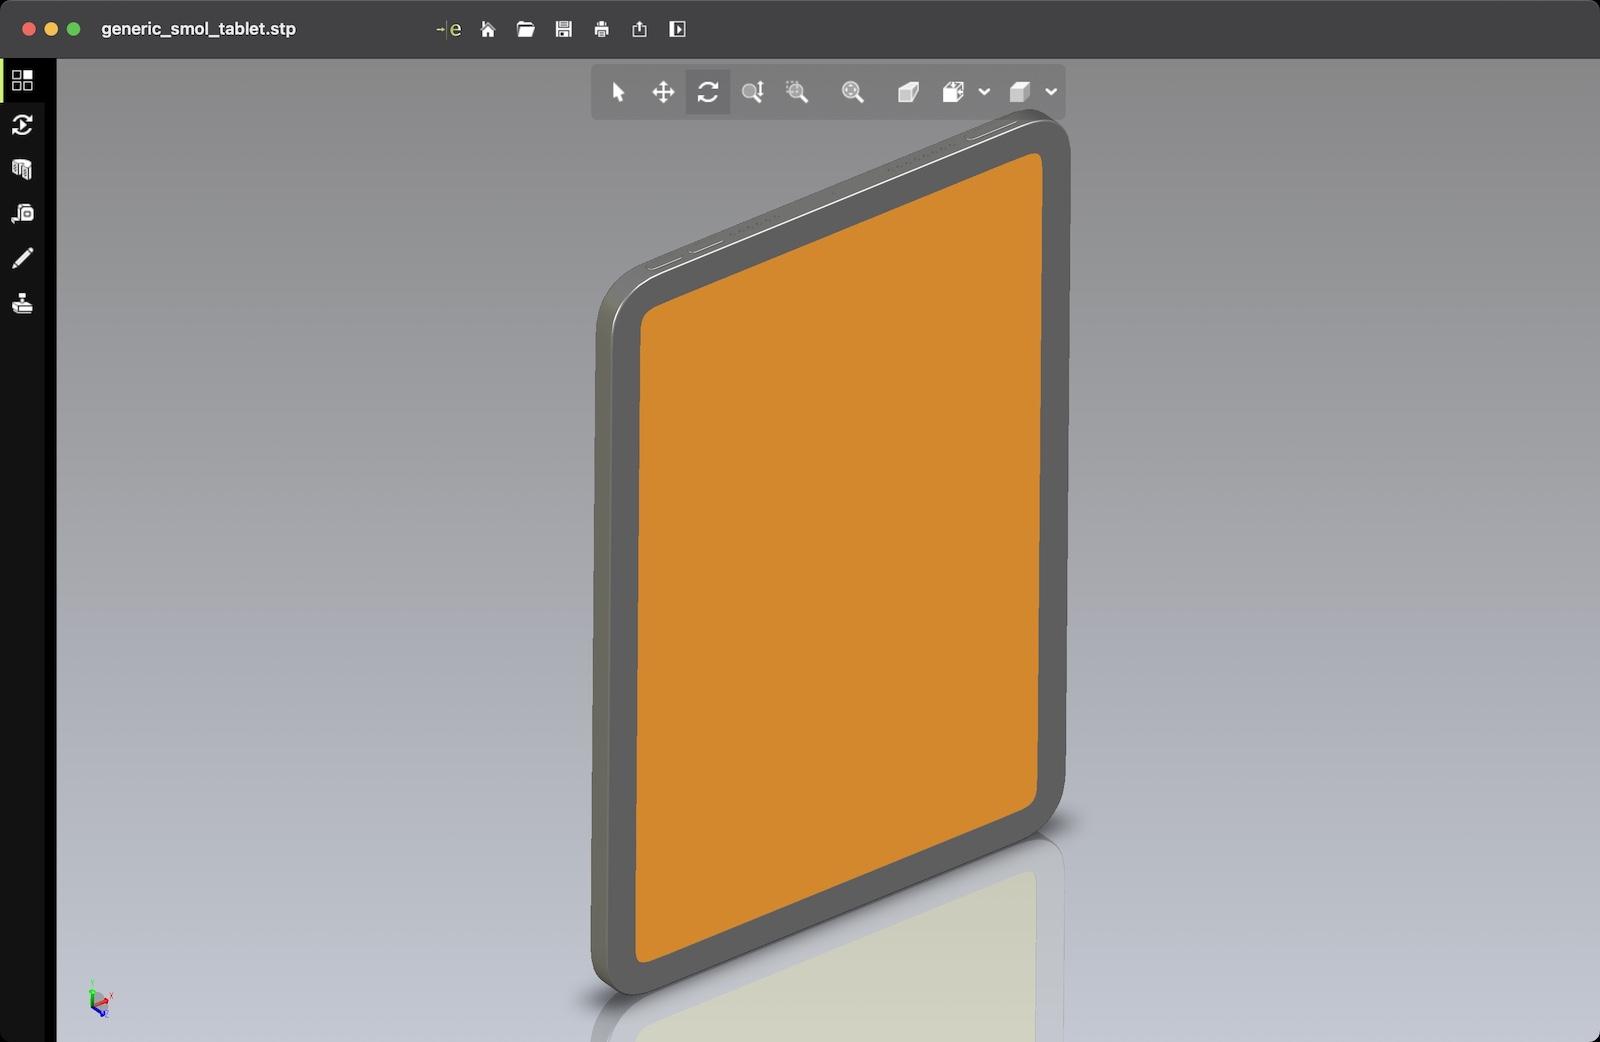 Ipad mini 6 cad render file 1